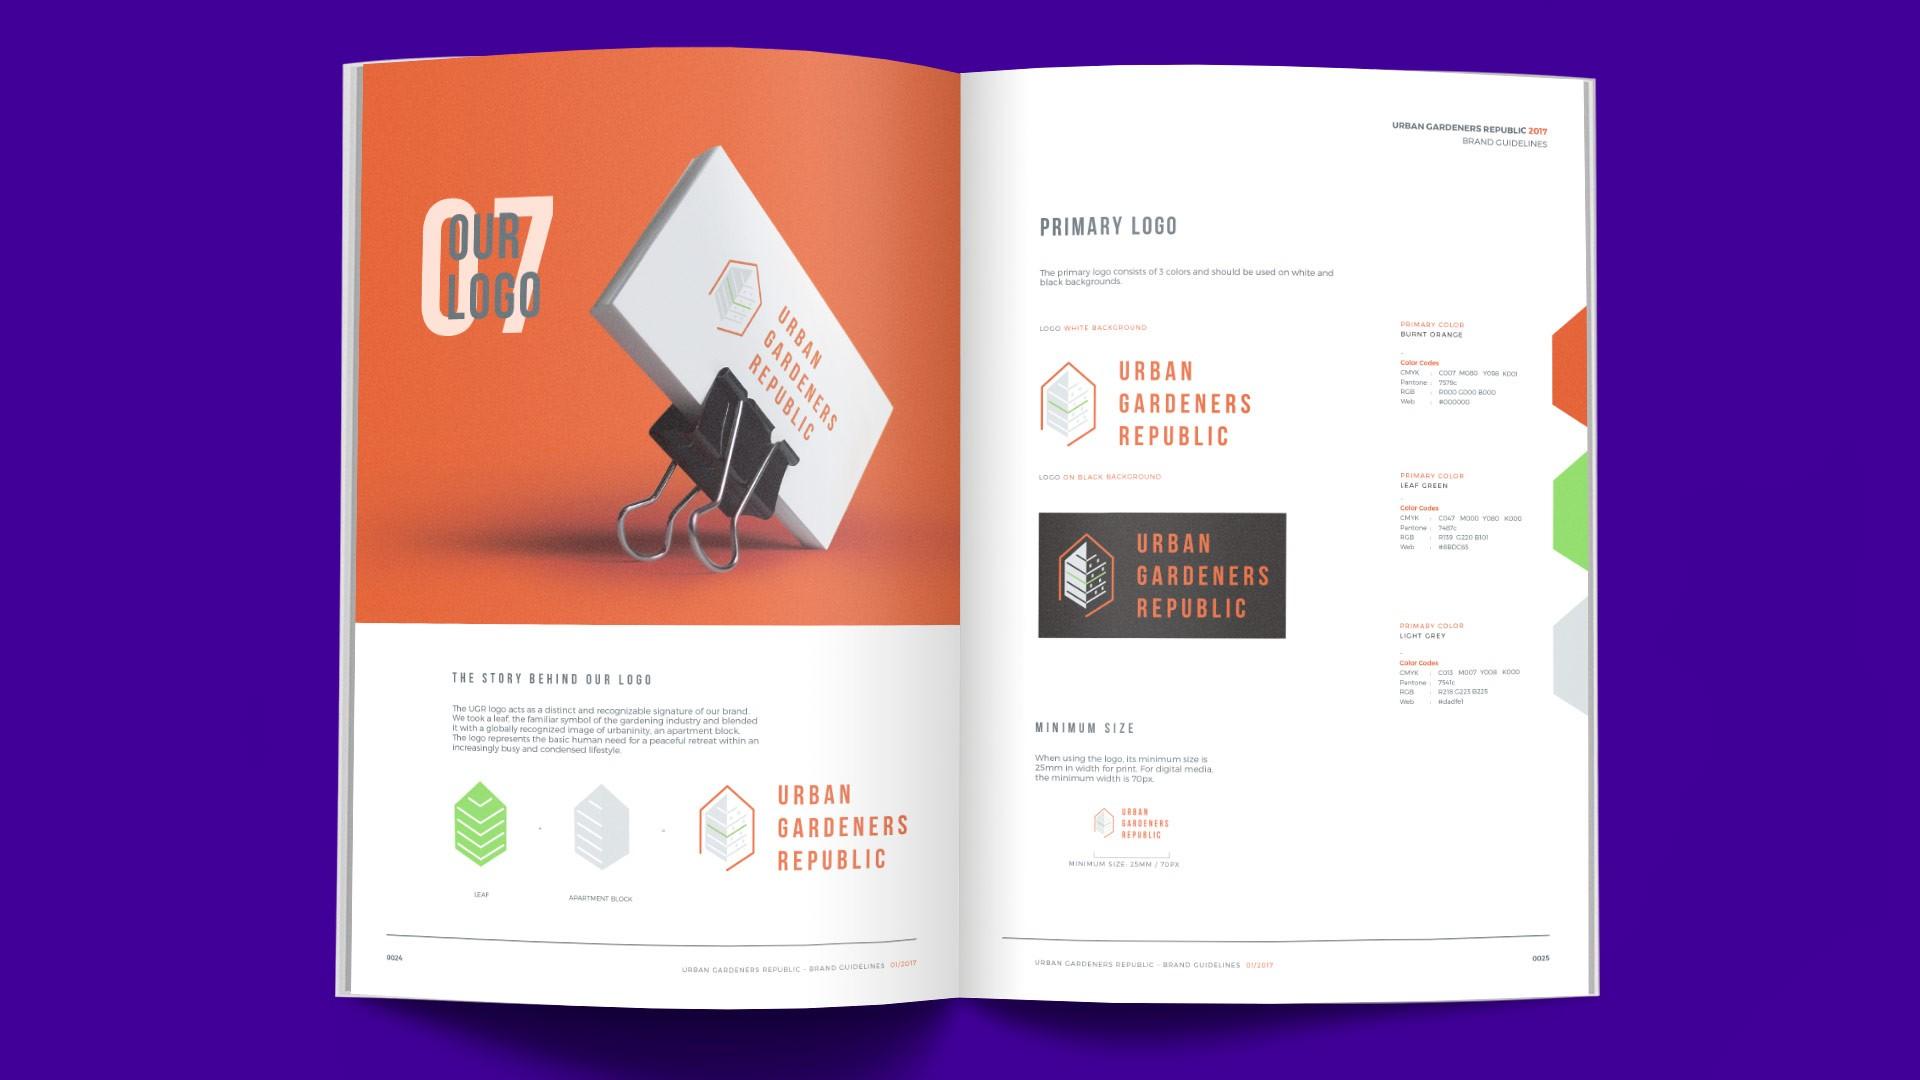 brand-identity-guidelines-design